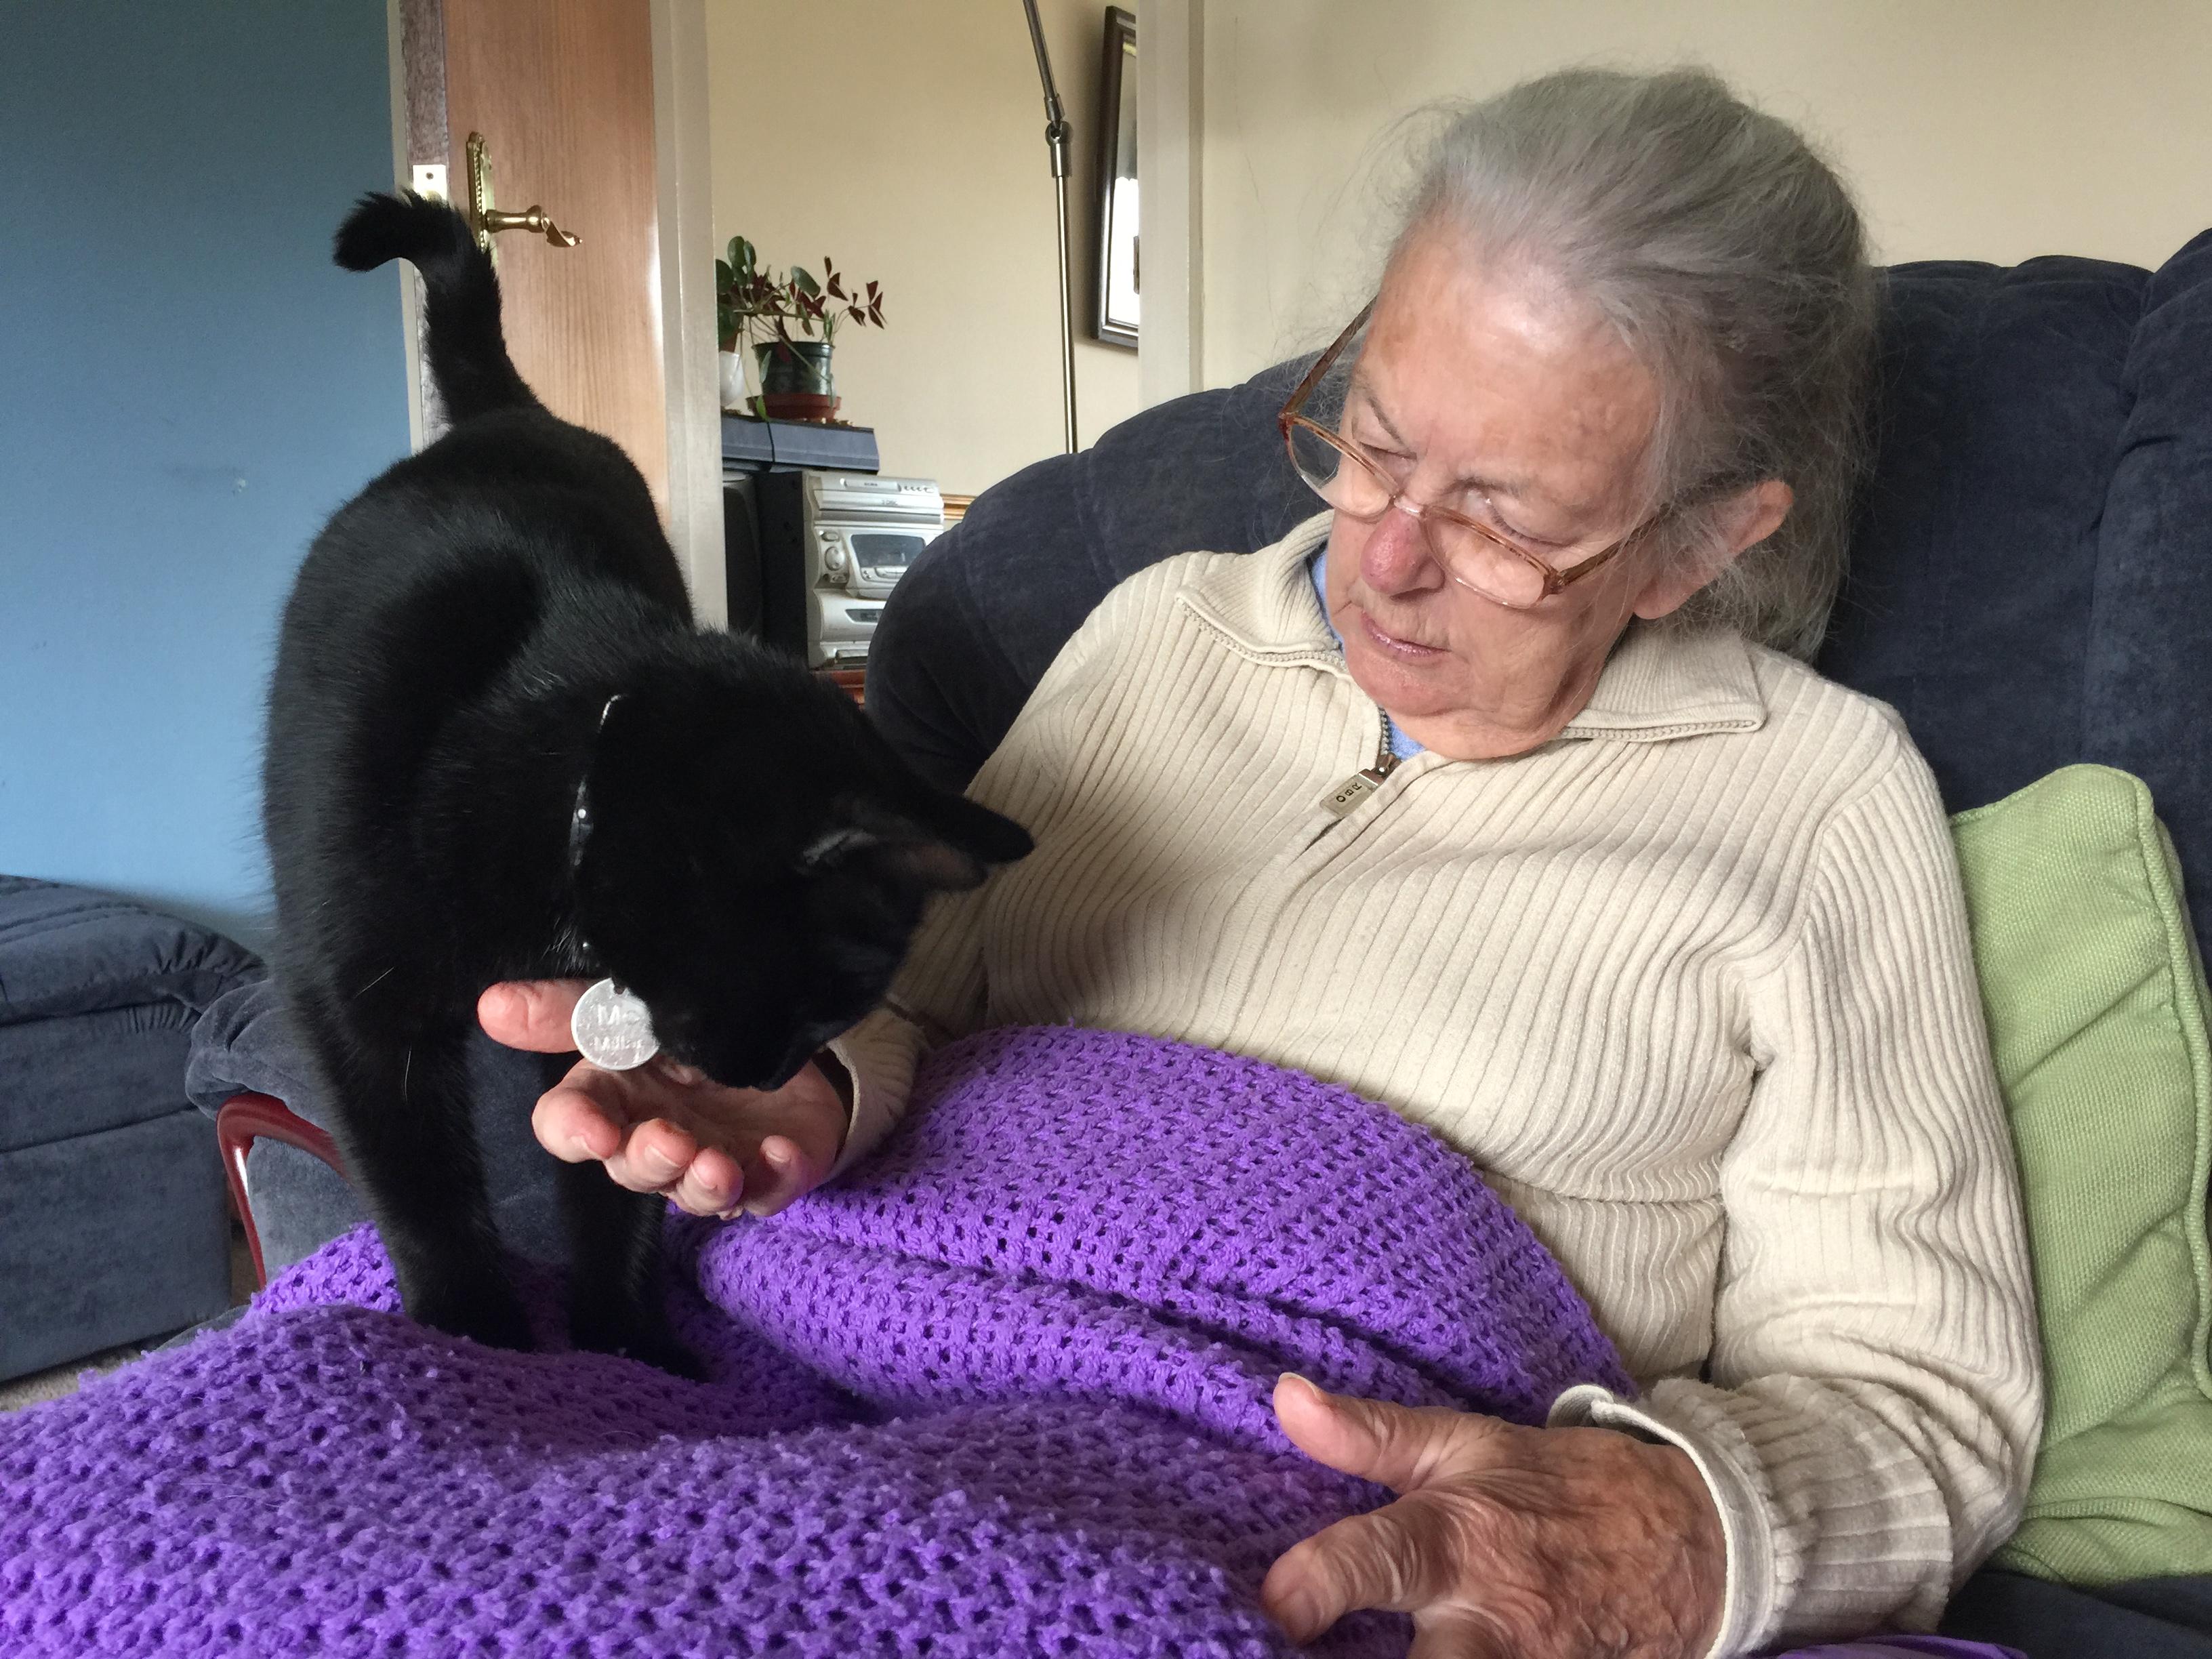 Mum with Mo the cat